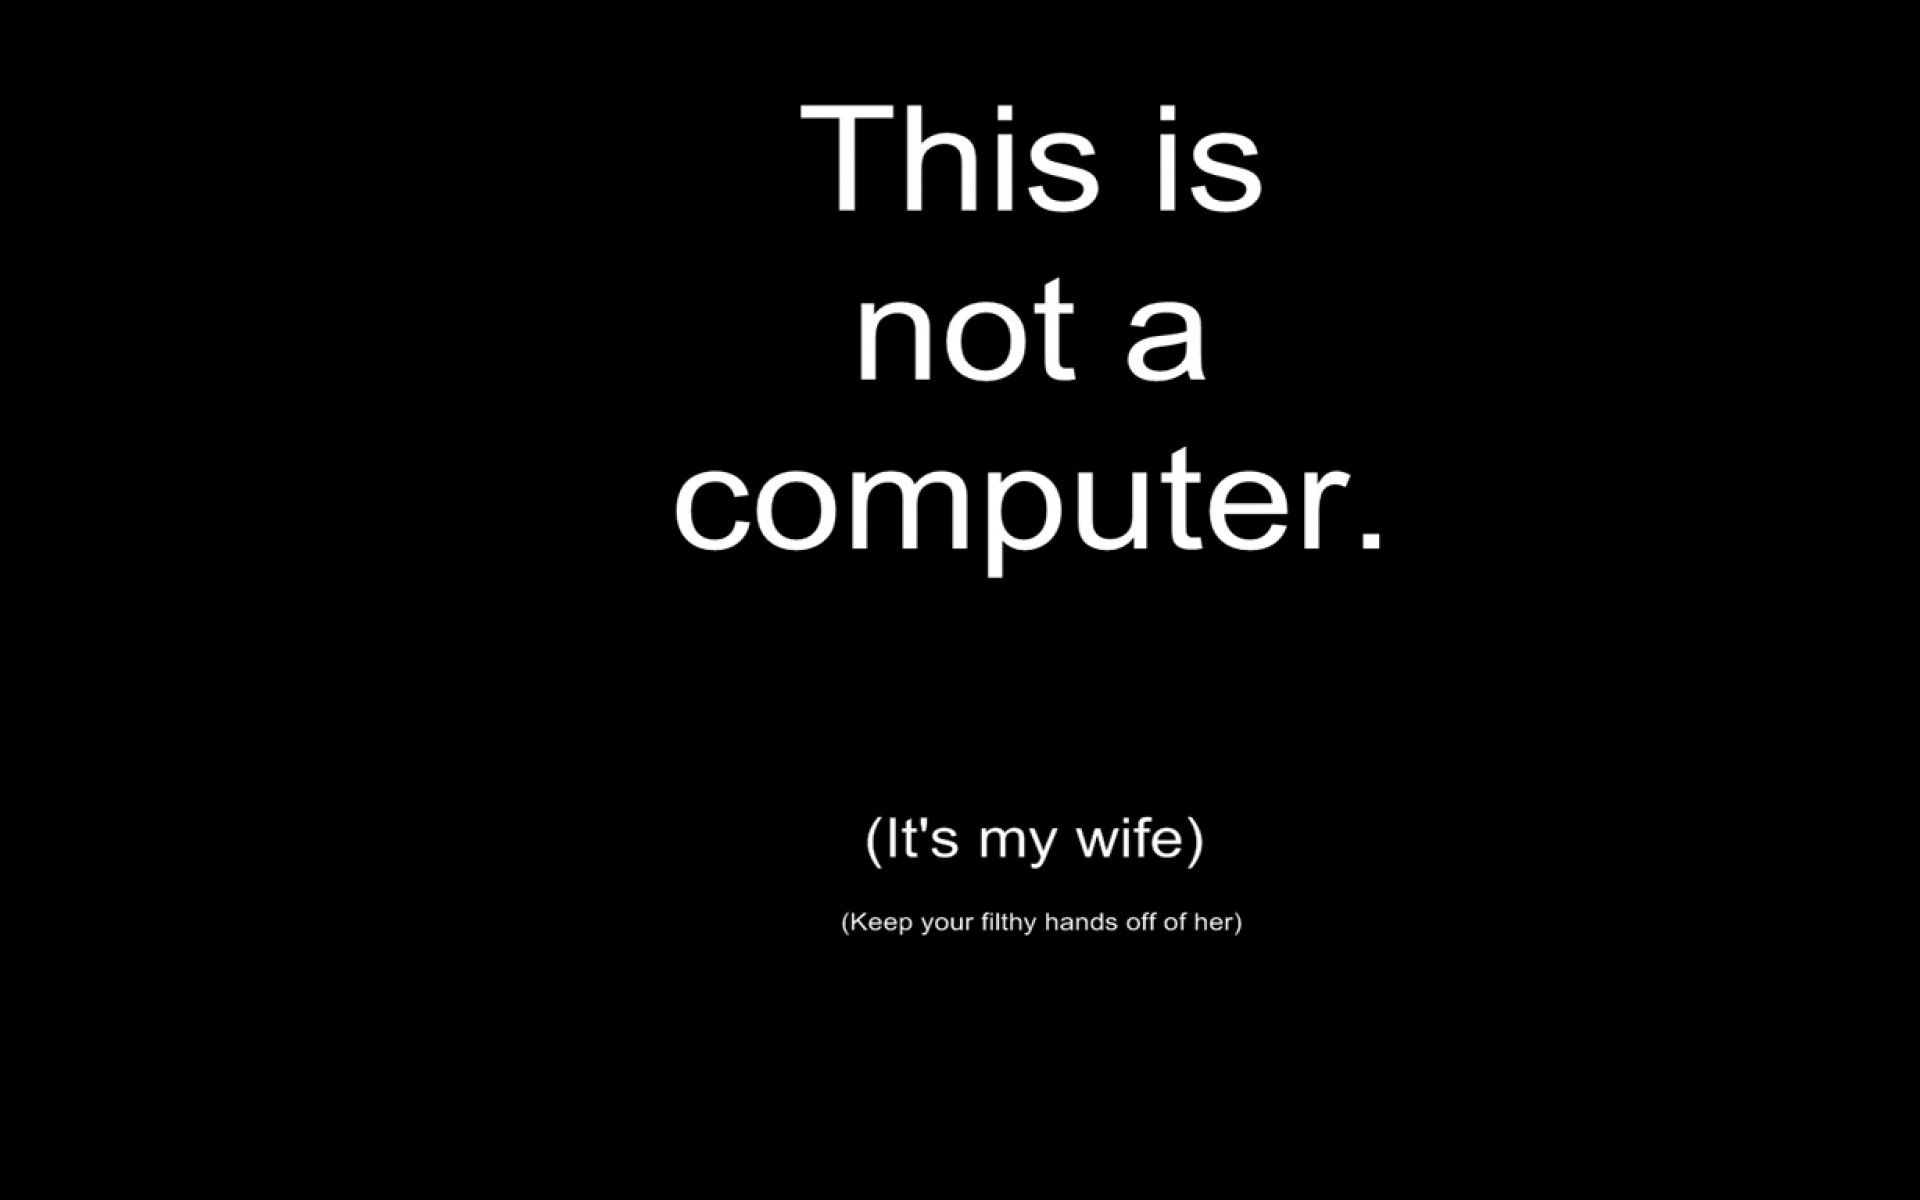 Geek Desktop Backgrounds The Best 68 Images In 2018 Computer Humor Work Quotes Funny Funny Wallpaper